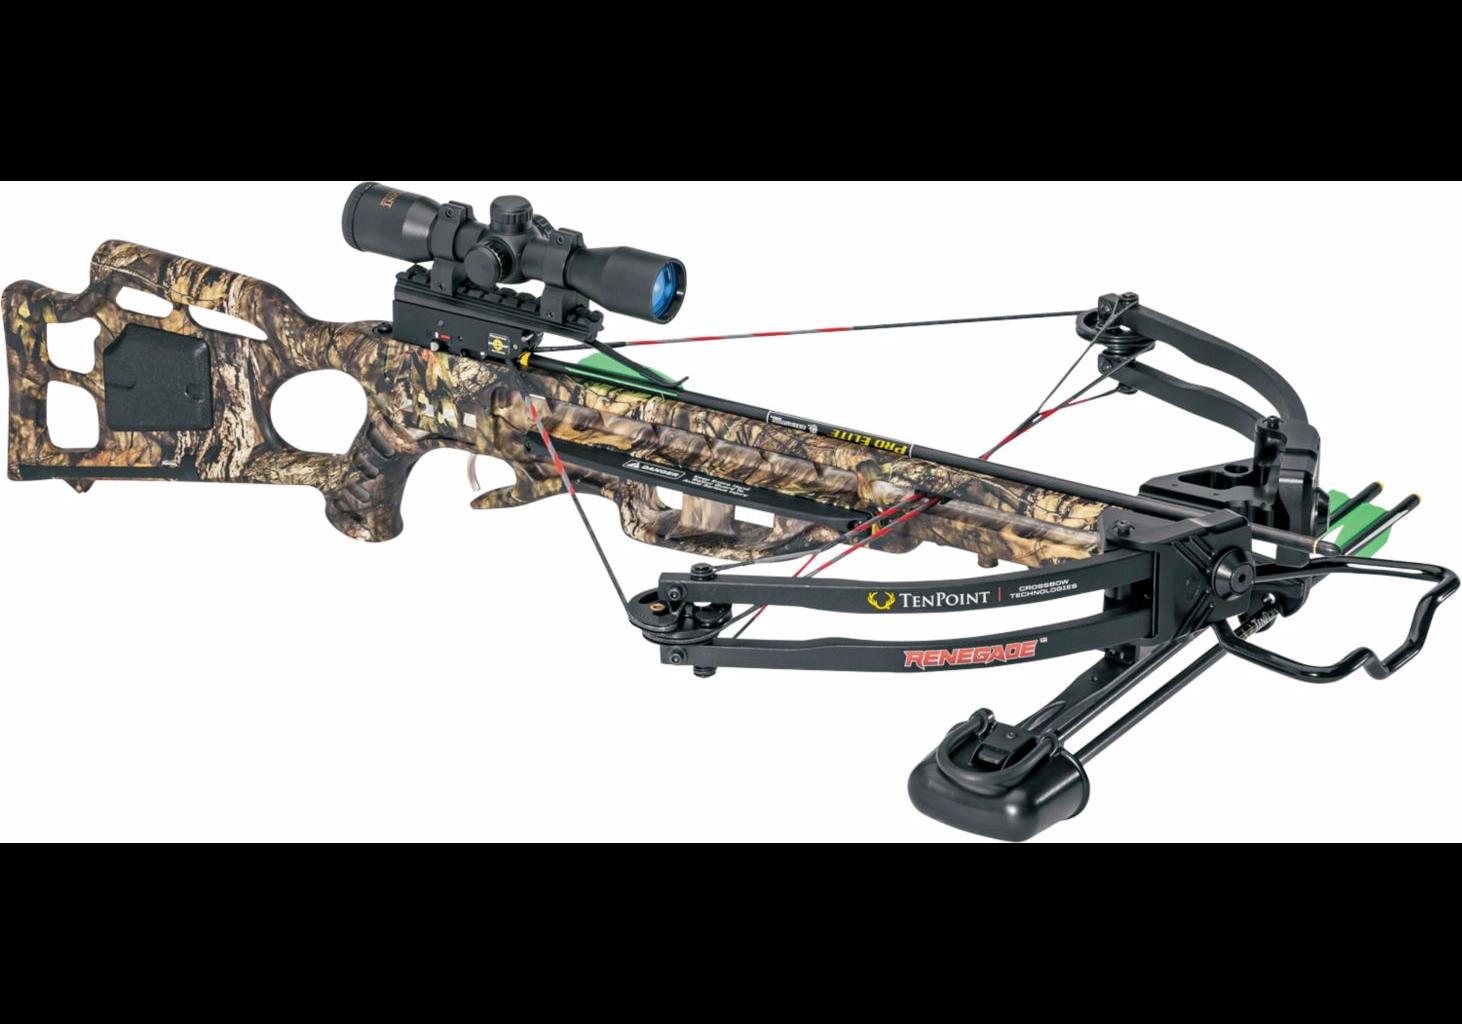 barnett vs tenpoint crossbows - HD1462×1024